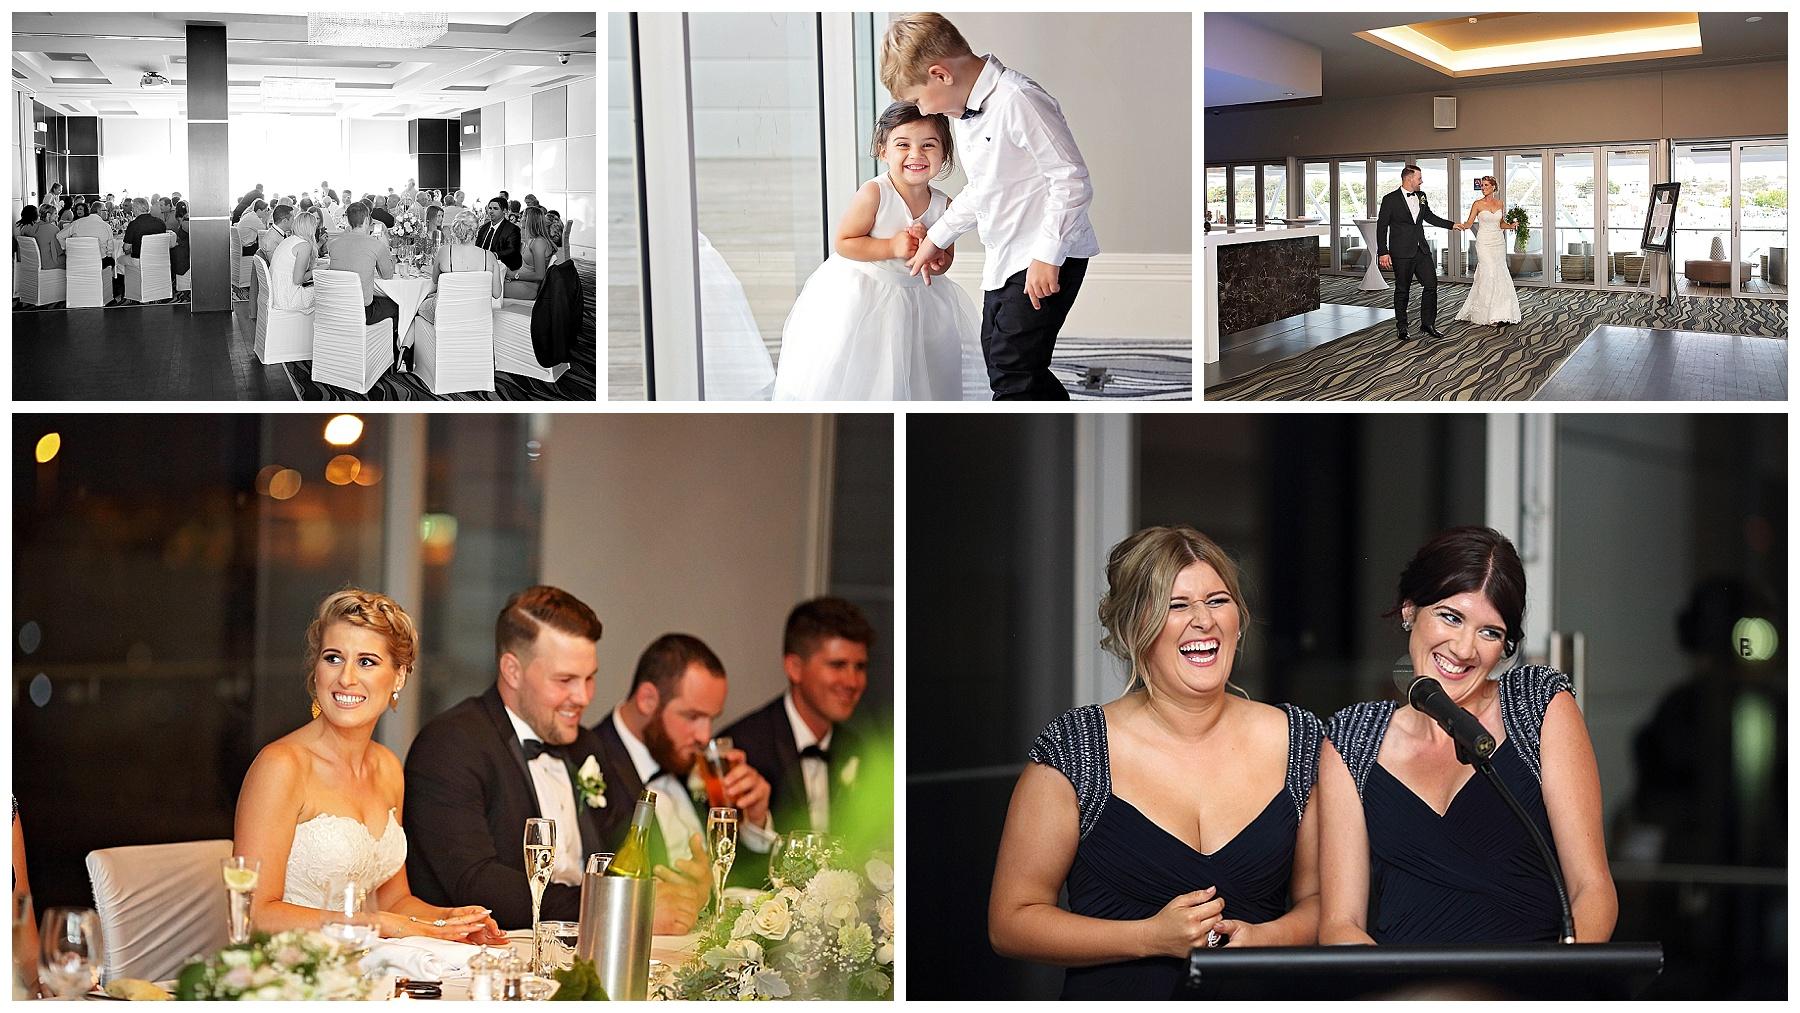 Wedding Venue with ocean view Perth